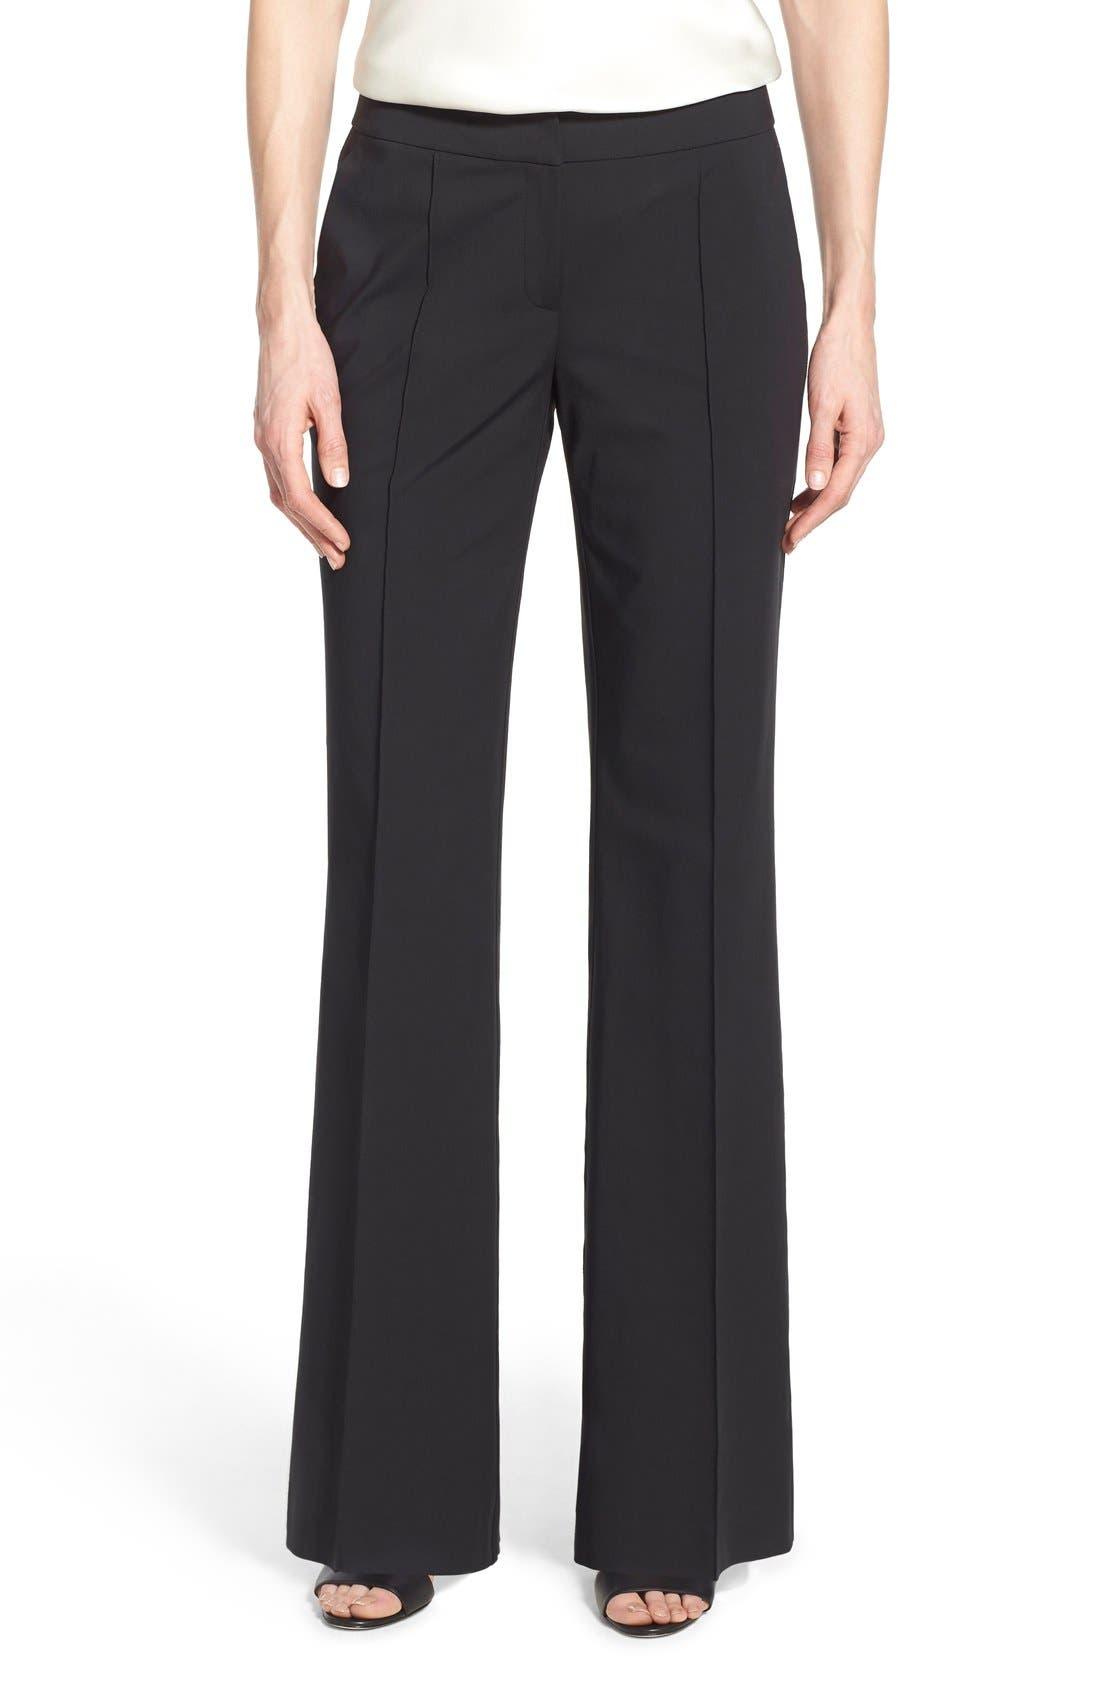 'Kenmare' Flare Leg Pants,                         Main,                         color, Black